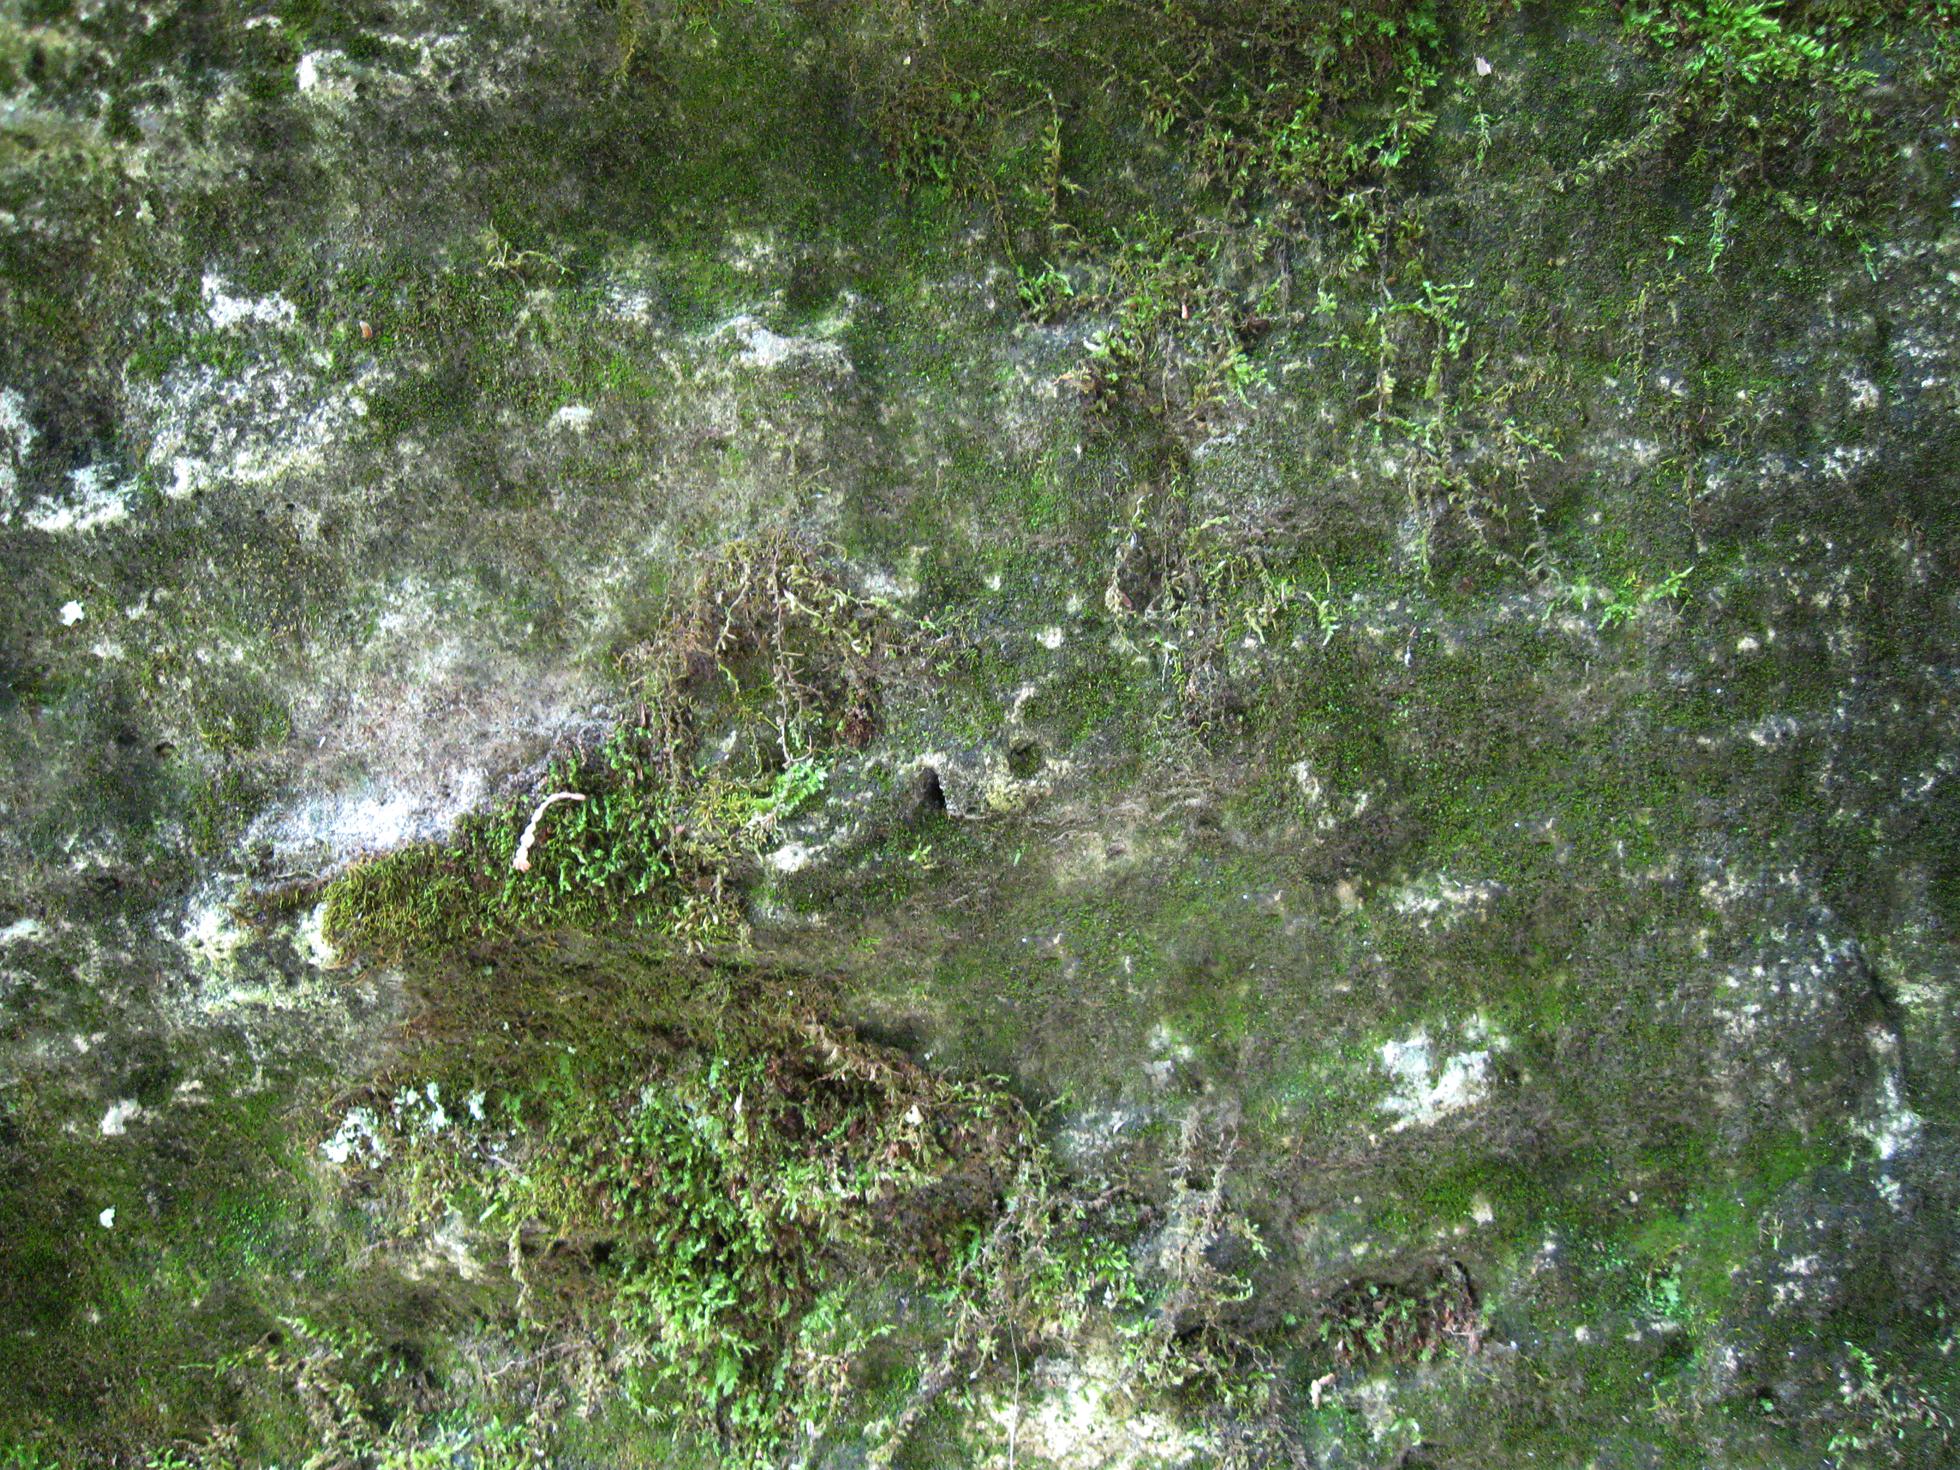 Mossy Rock by KThirteen on DeviantArt